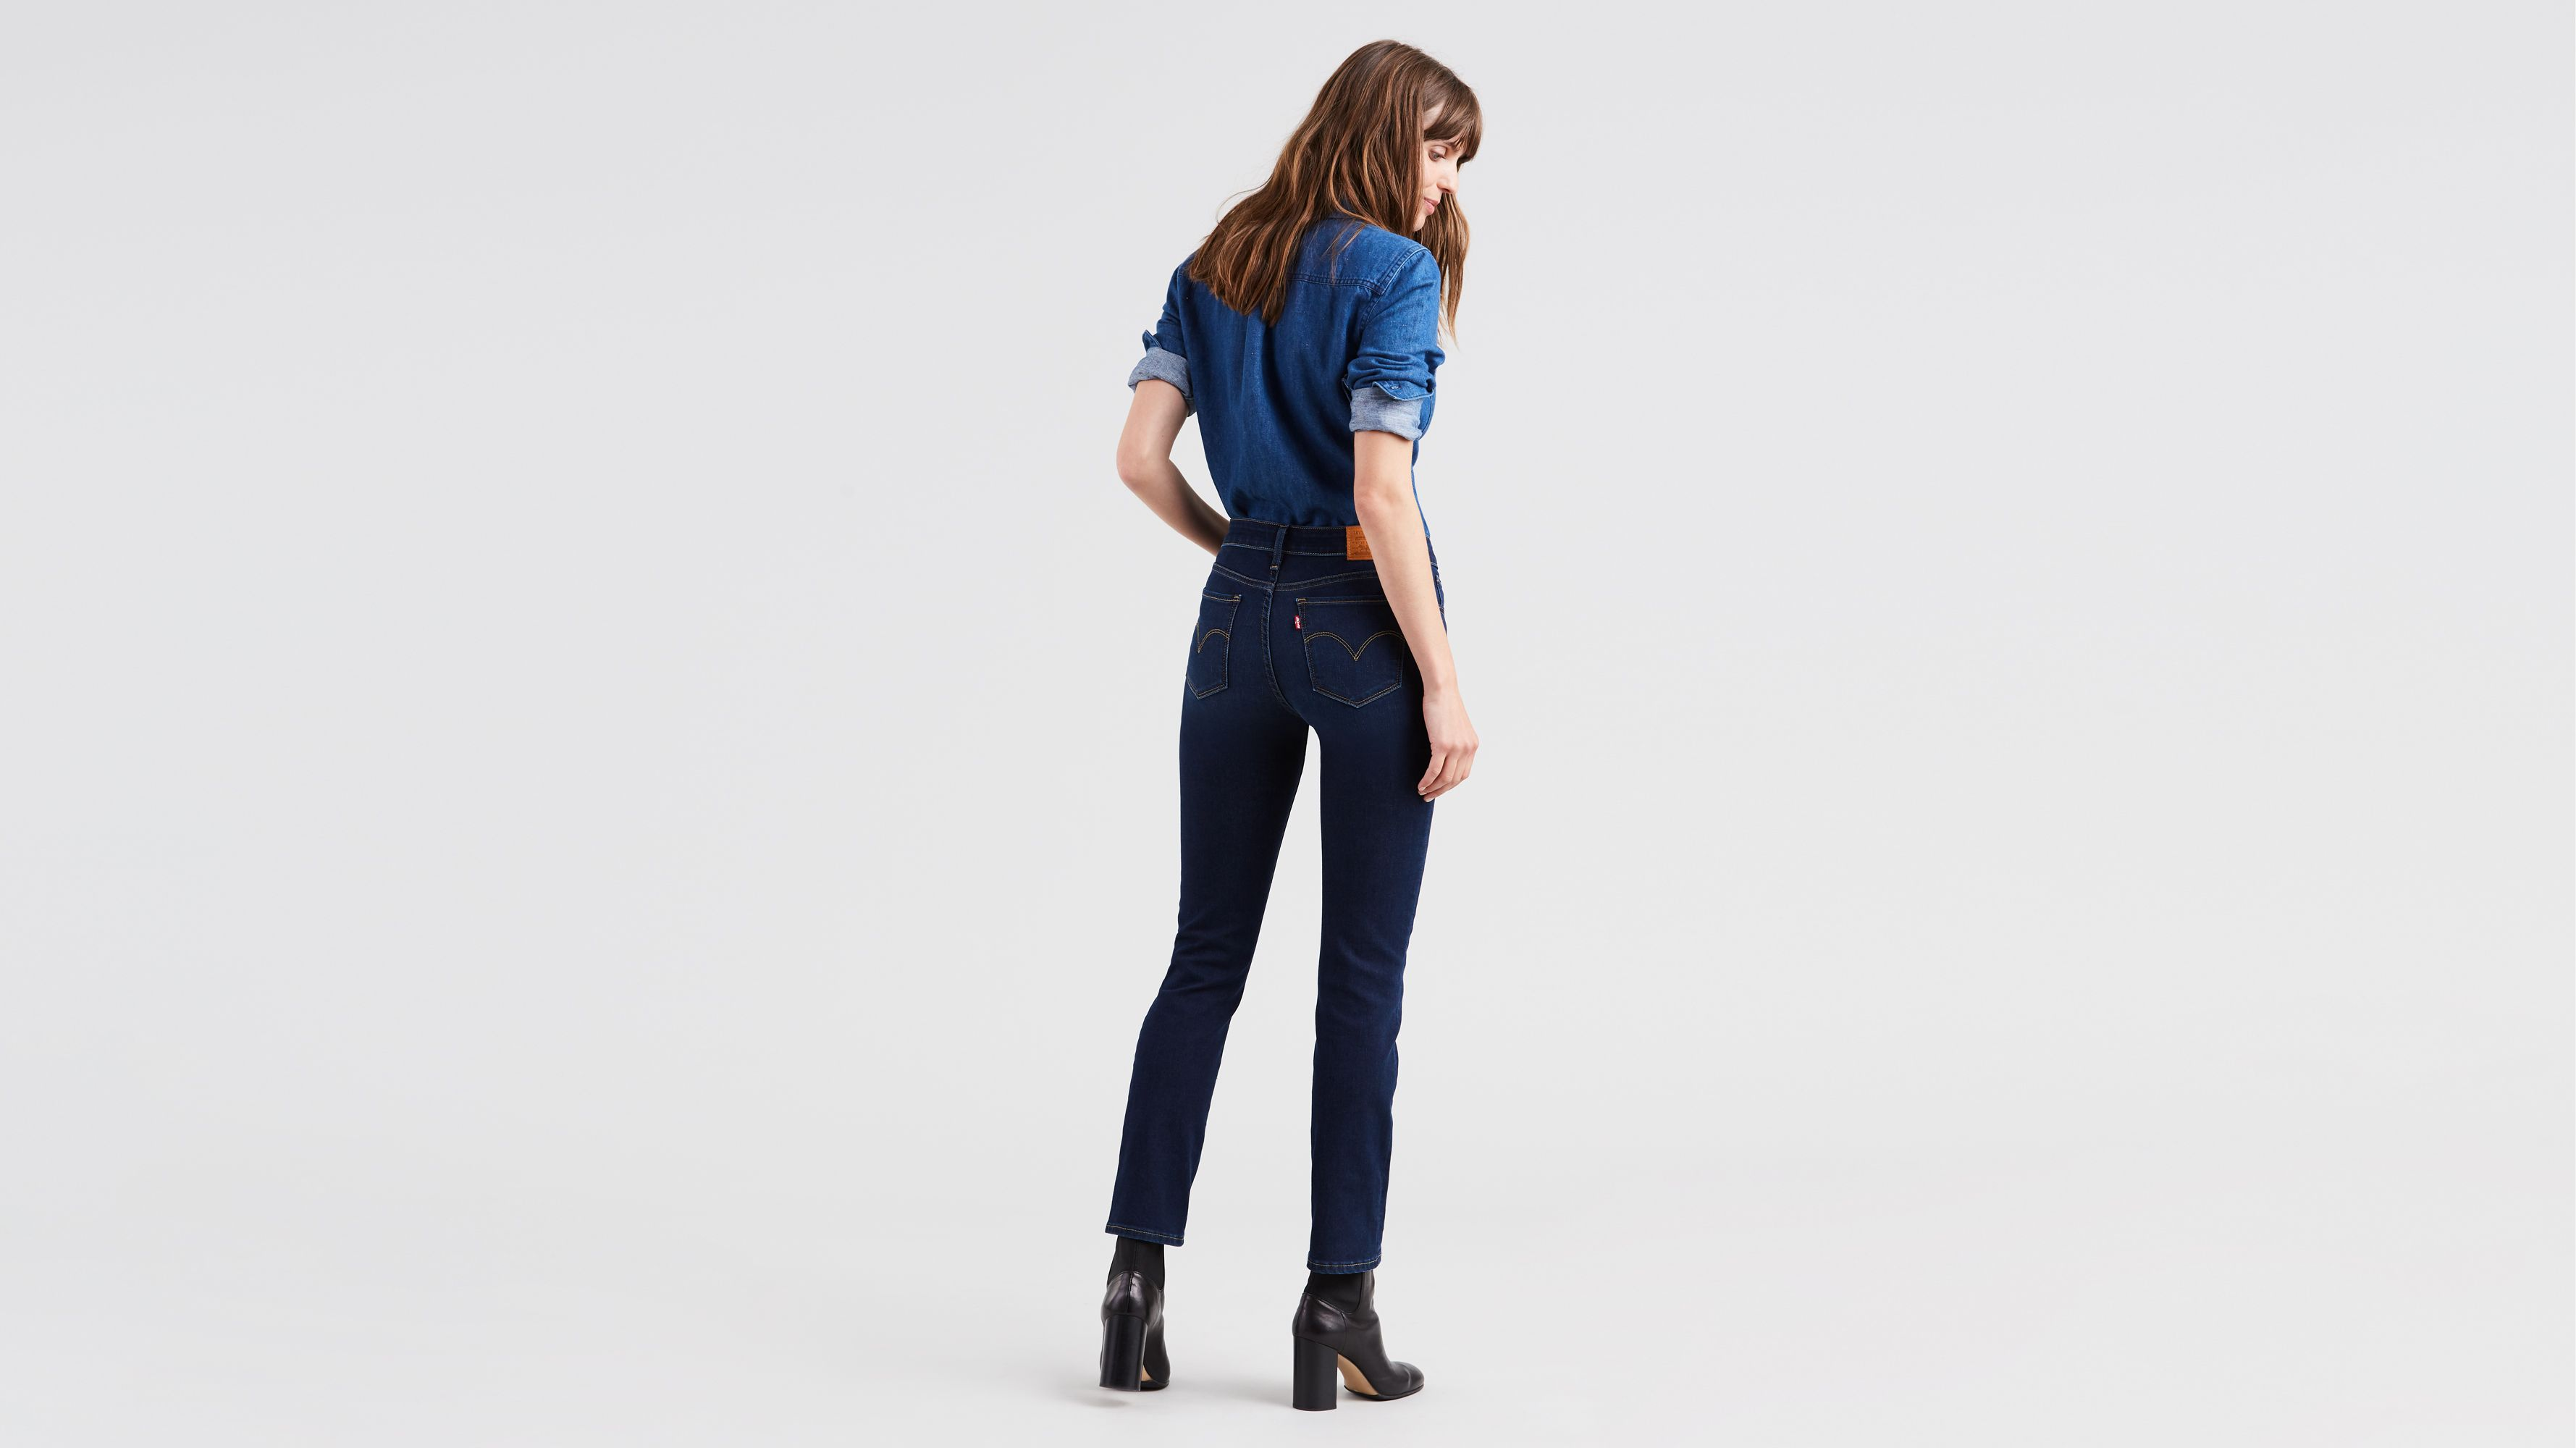 f7473ea9 712™ Slim Jeans - Dark Blue | Levi's® GB